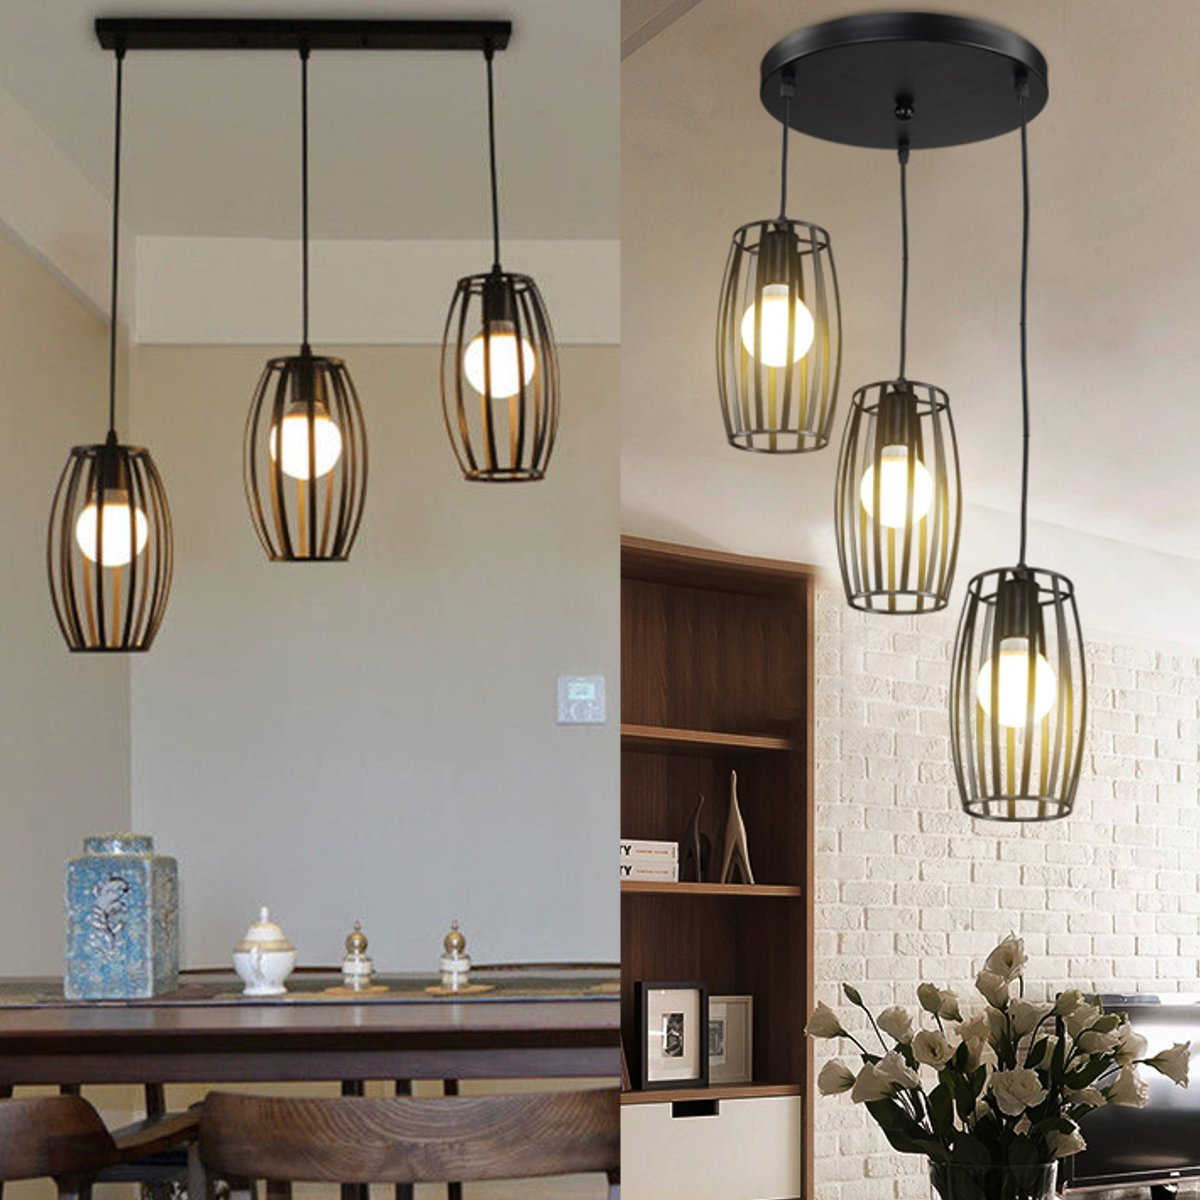 Vintage Pendant Light Loft Lighting Kitchen Bar Ceiling Lamp Fixtures Dining Room Shop Bar Decoration Pendant Light